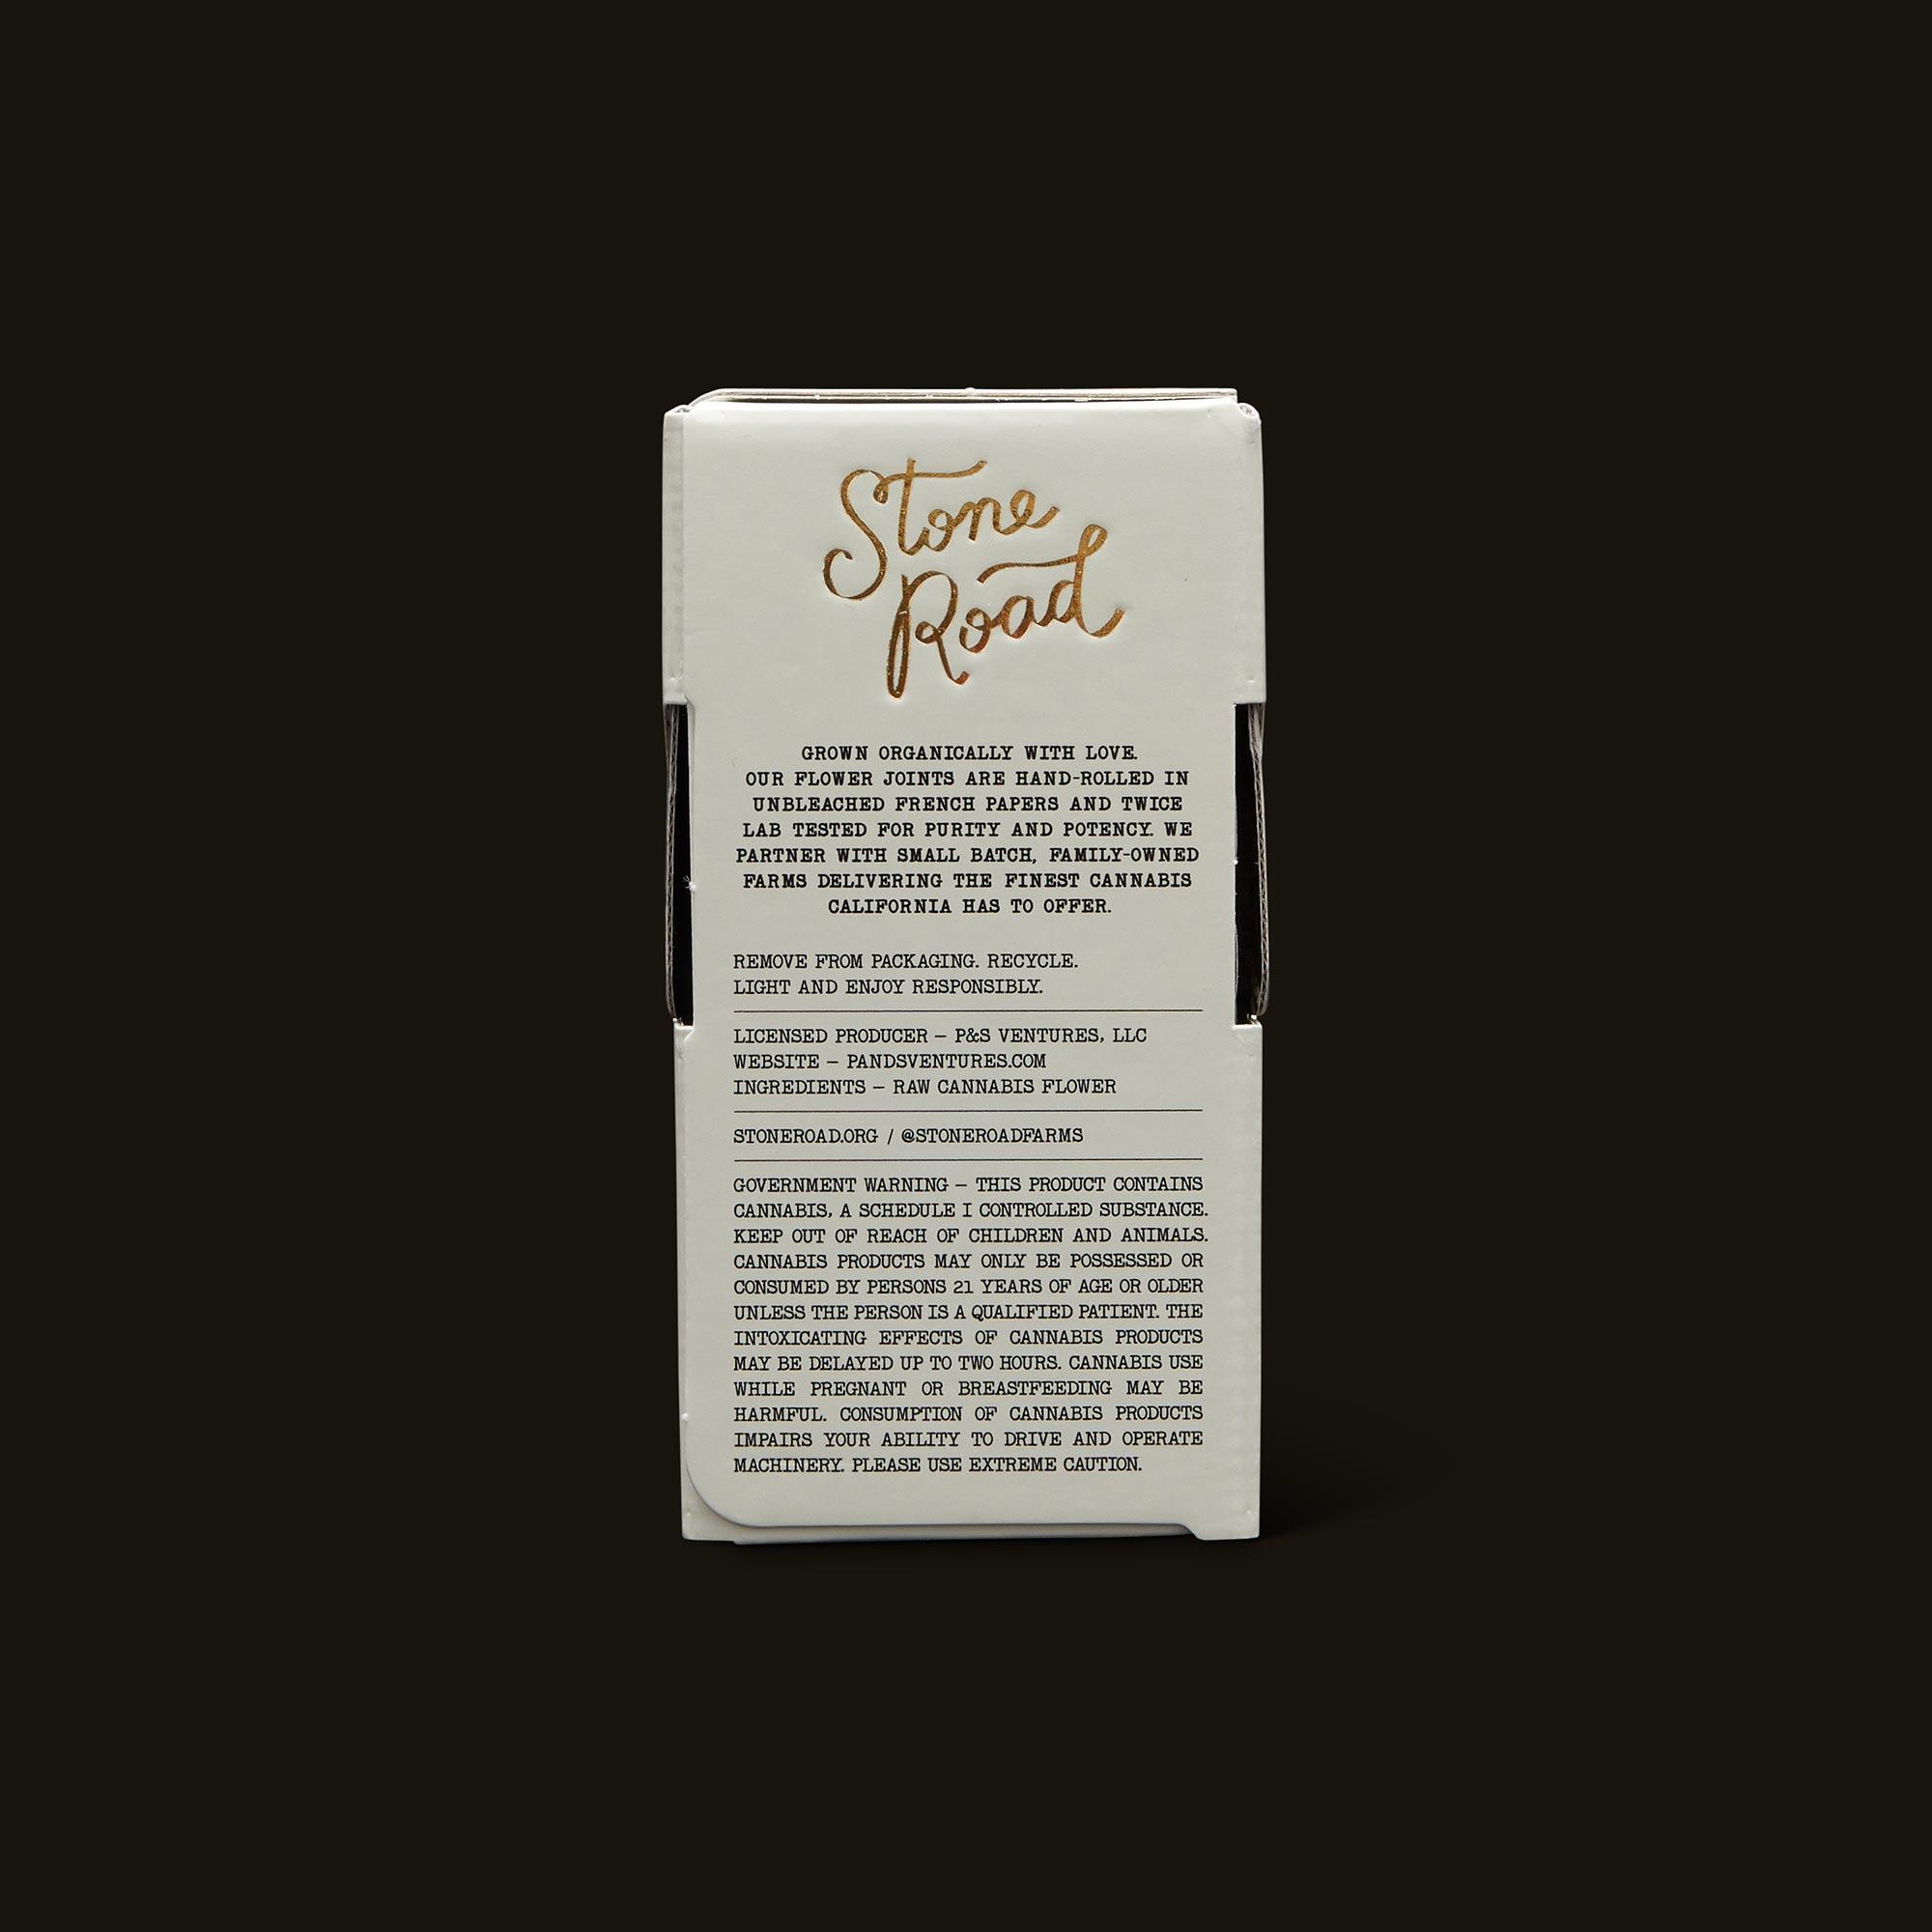 Stone Road Pre-Rolls - Lemon Haze Infused Pre-Roll Pack